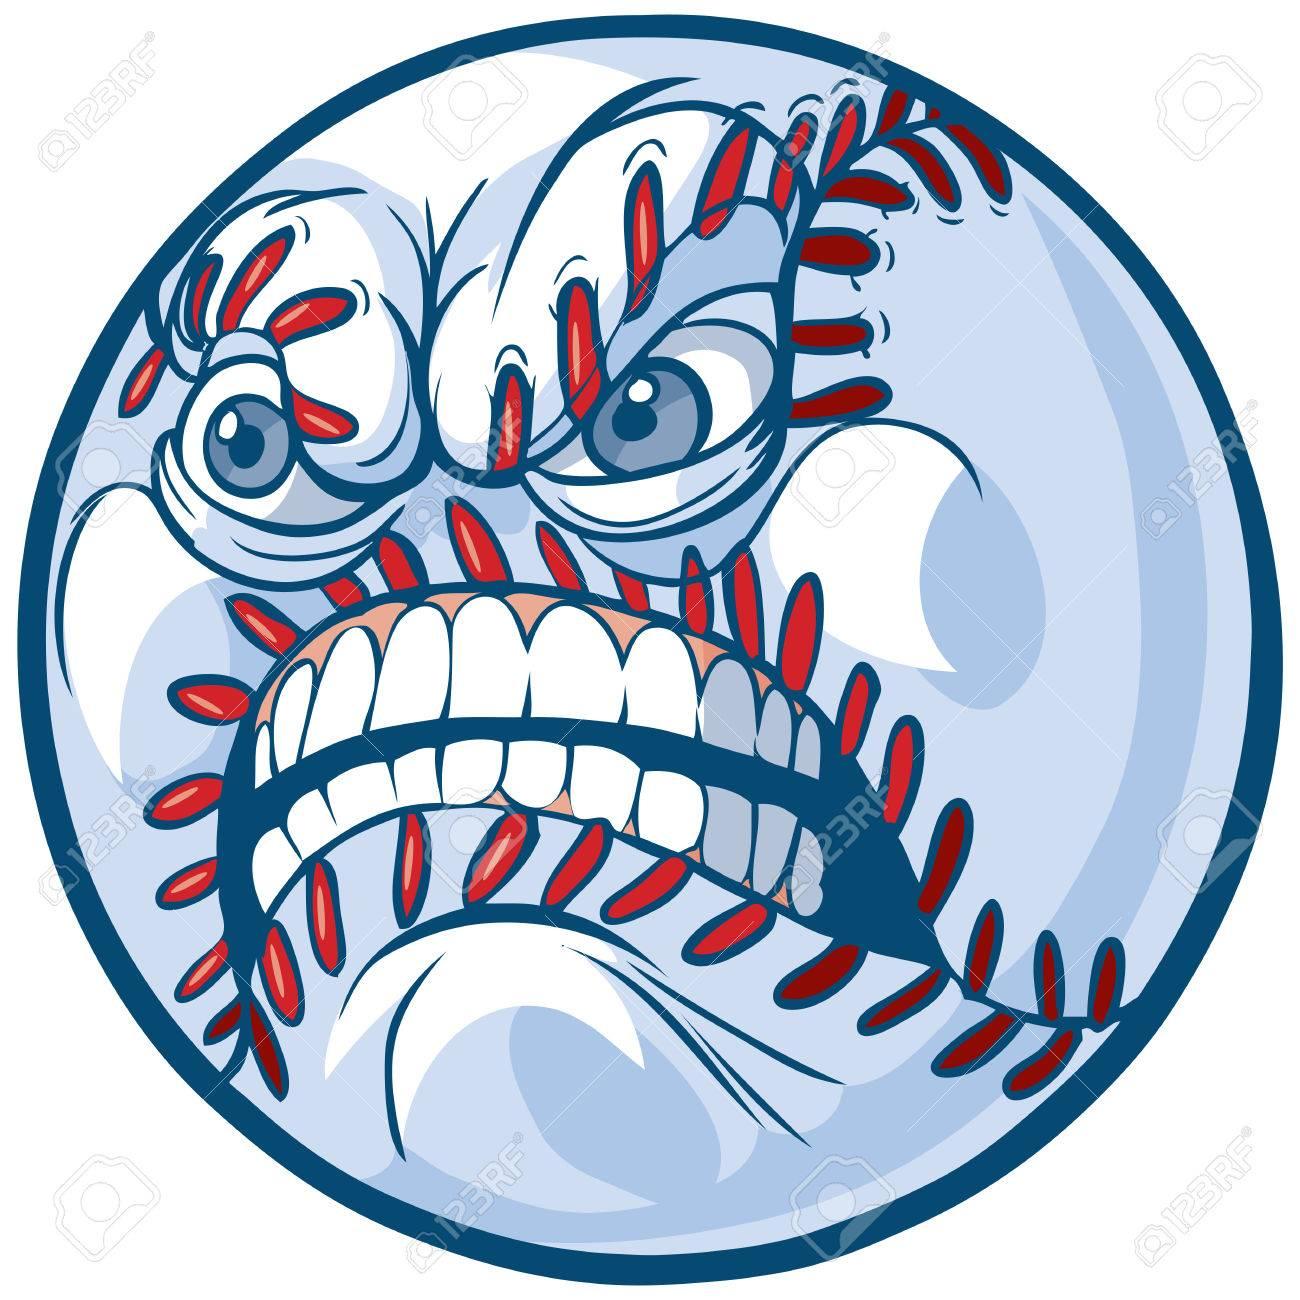 Vector Cartoon Clip Art Illustration Of A Baseball Or Softball